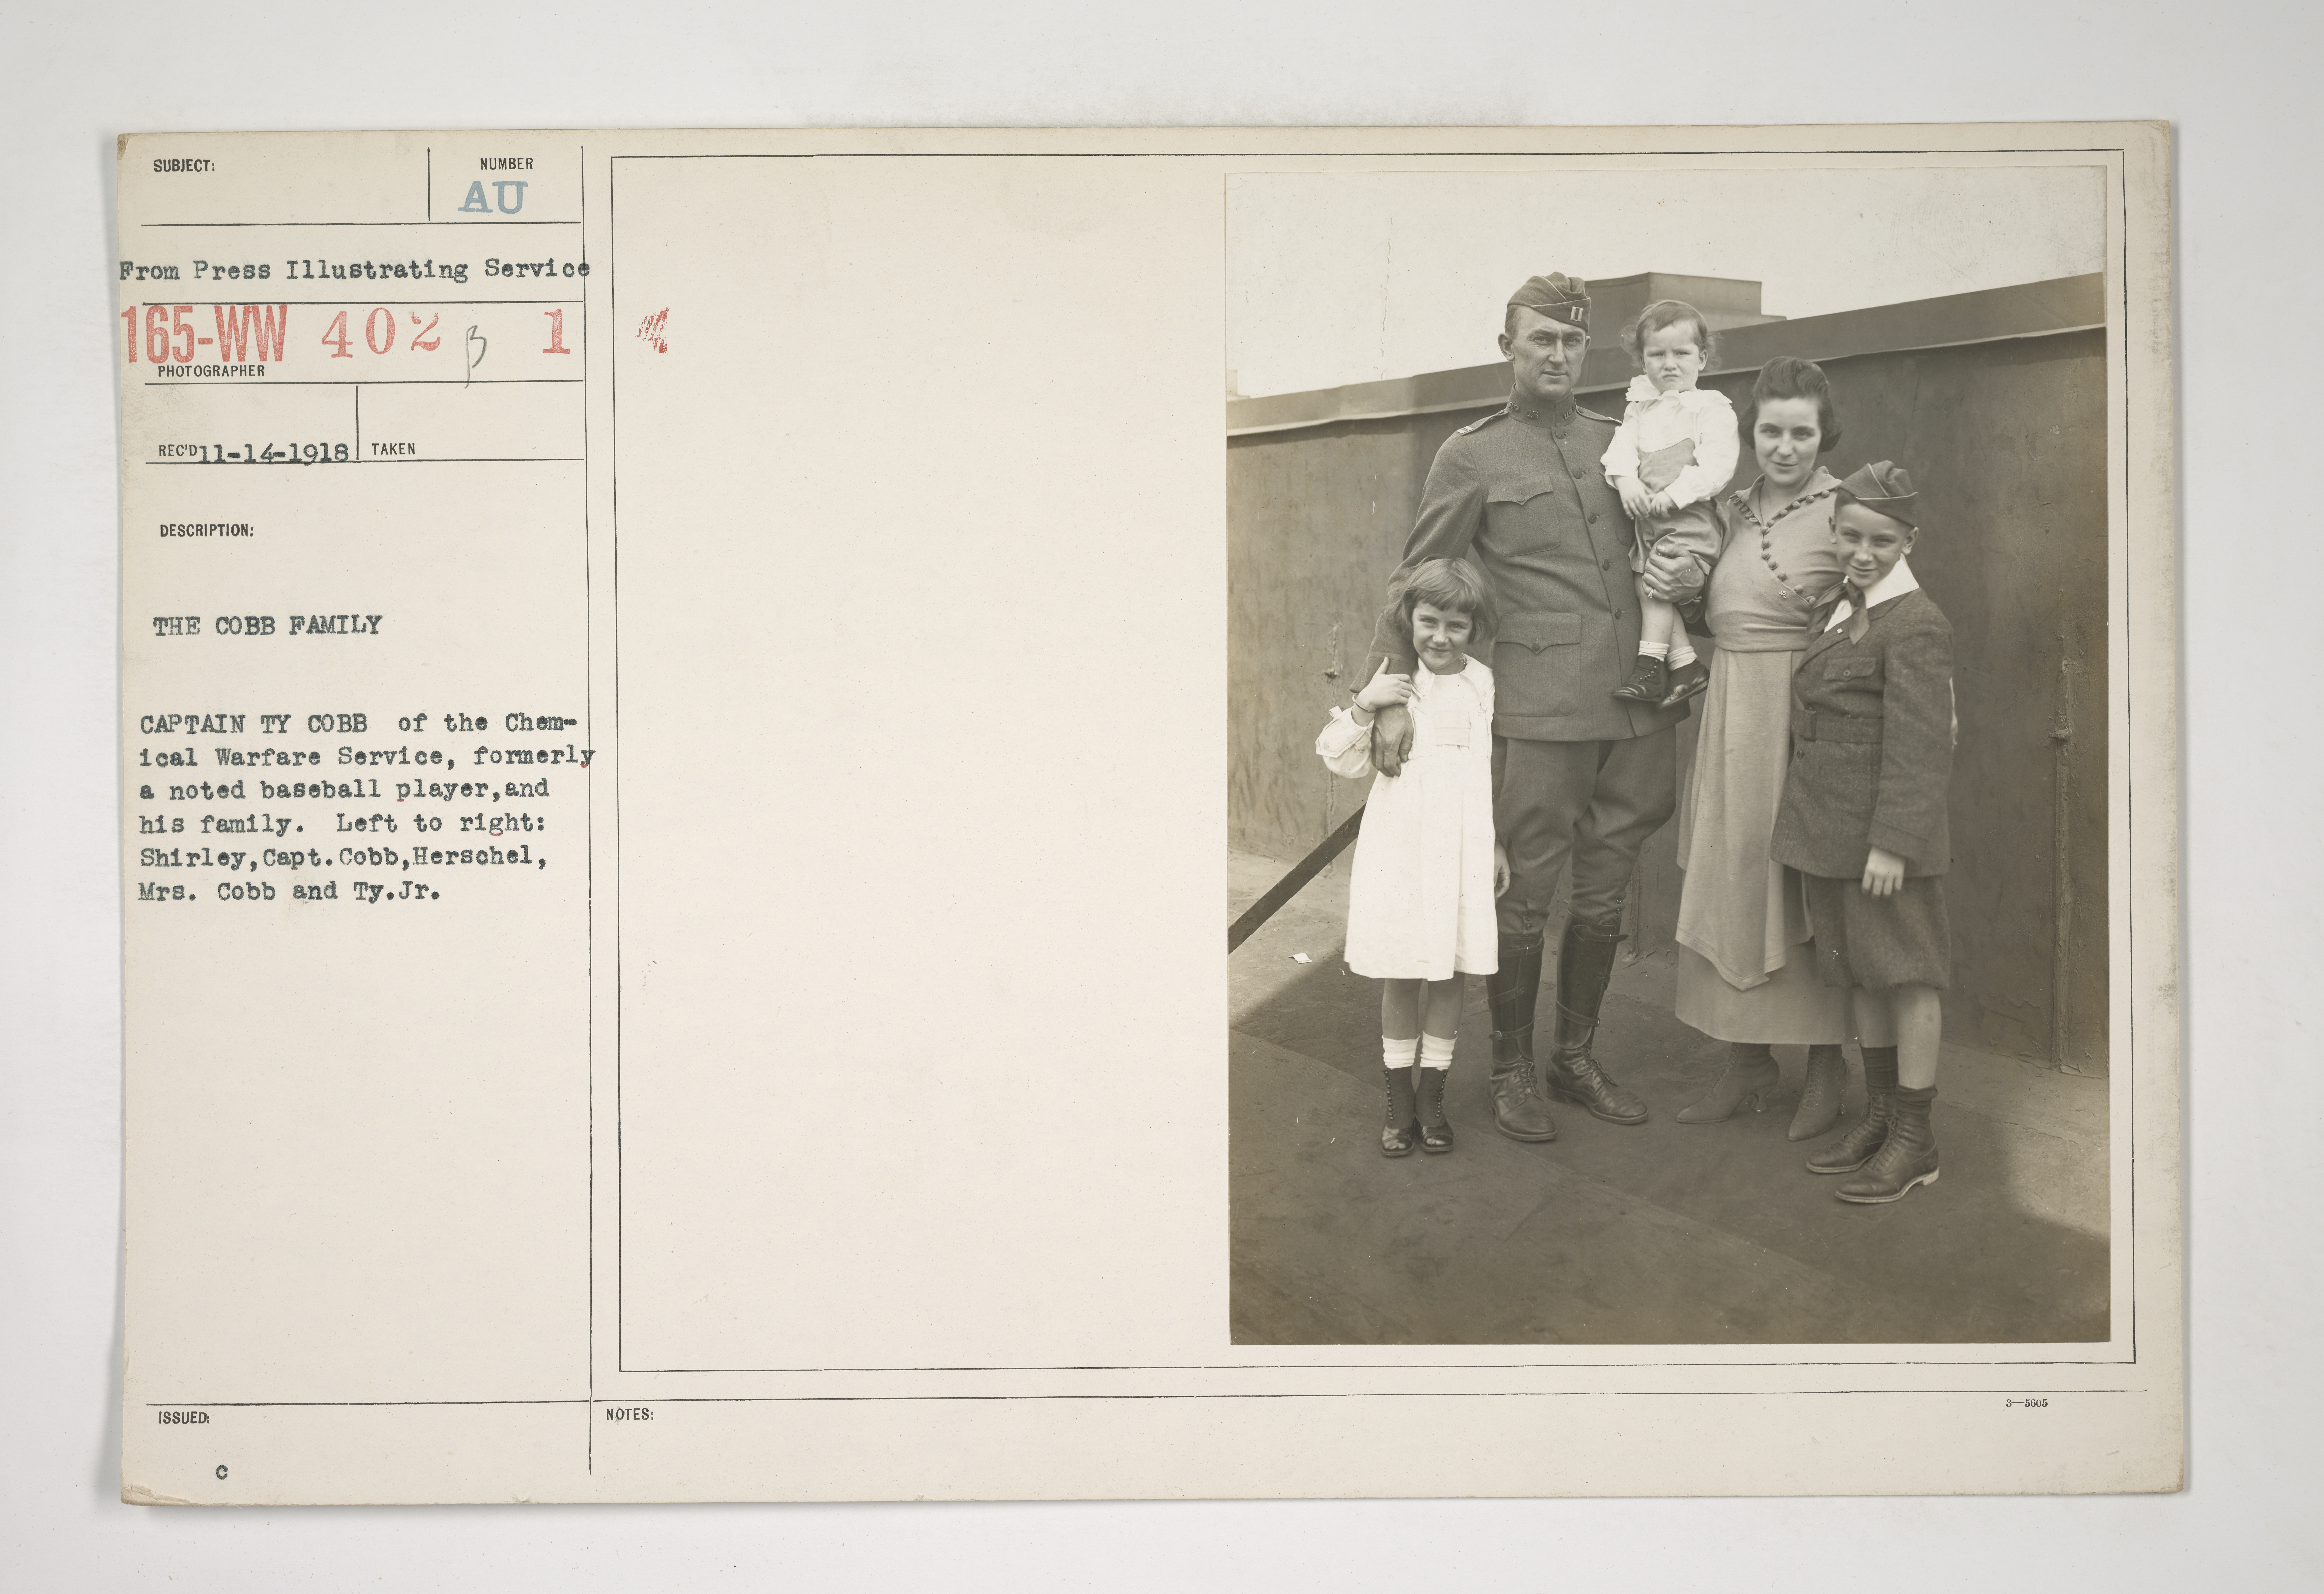 Personnel - Cobb through Cushing [165-WW-402B-1]